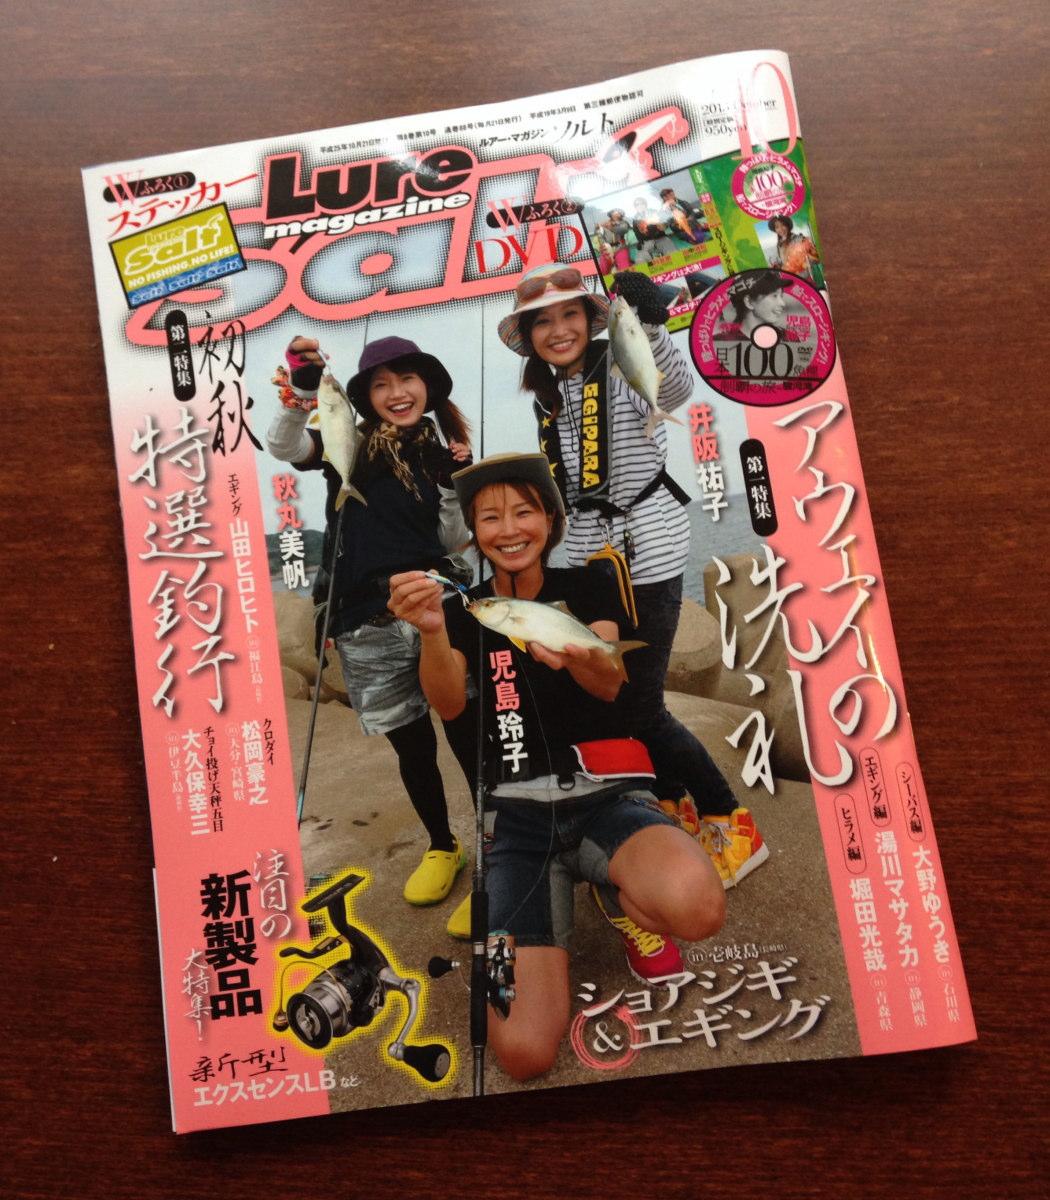 Lure Magazine Salt